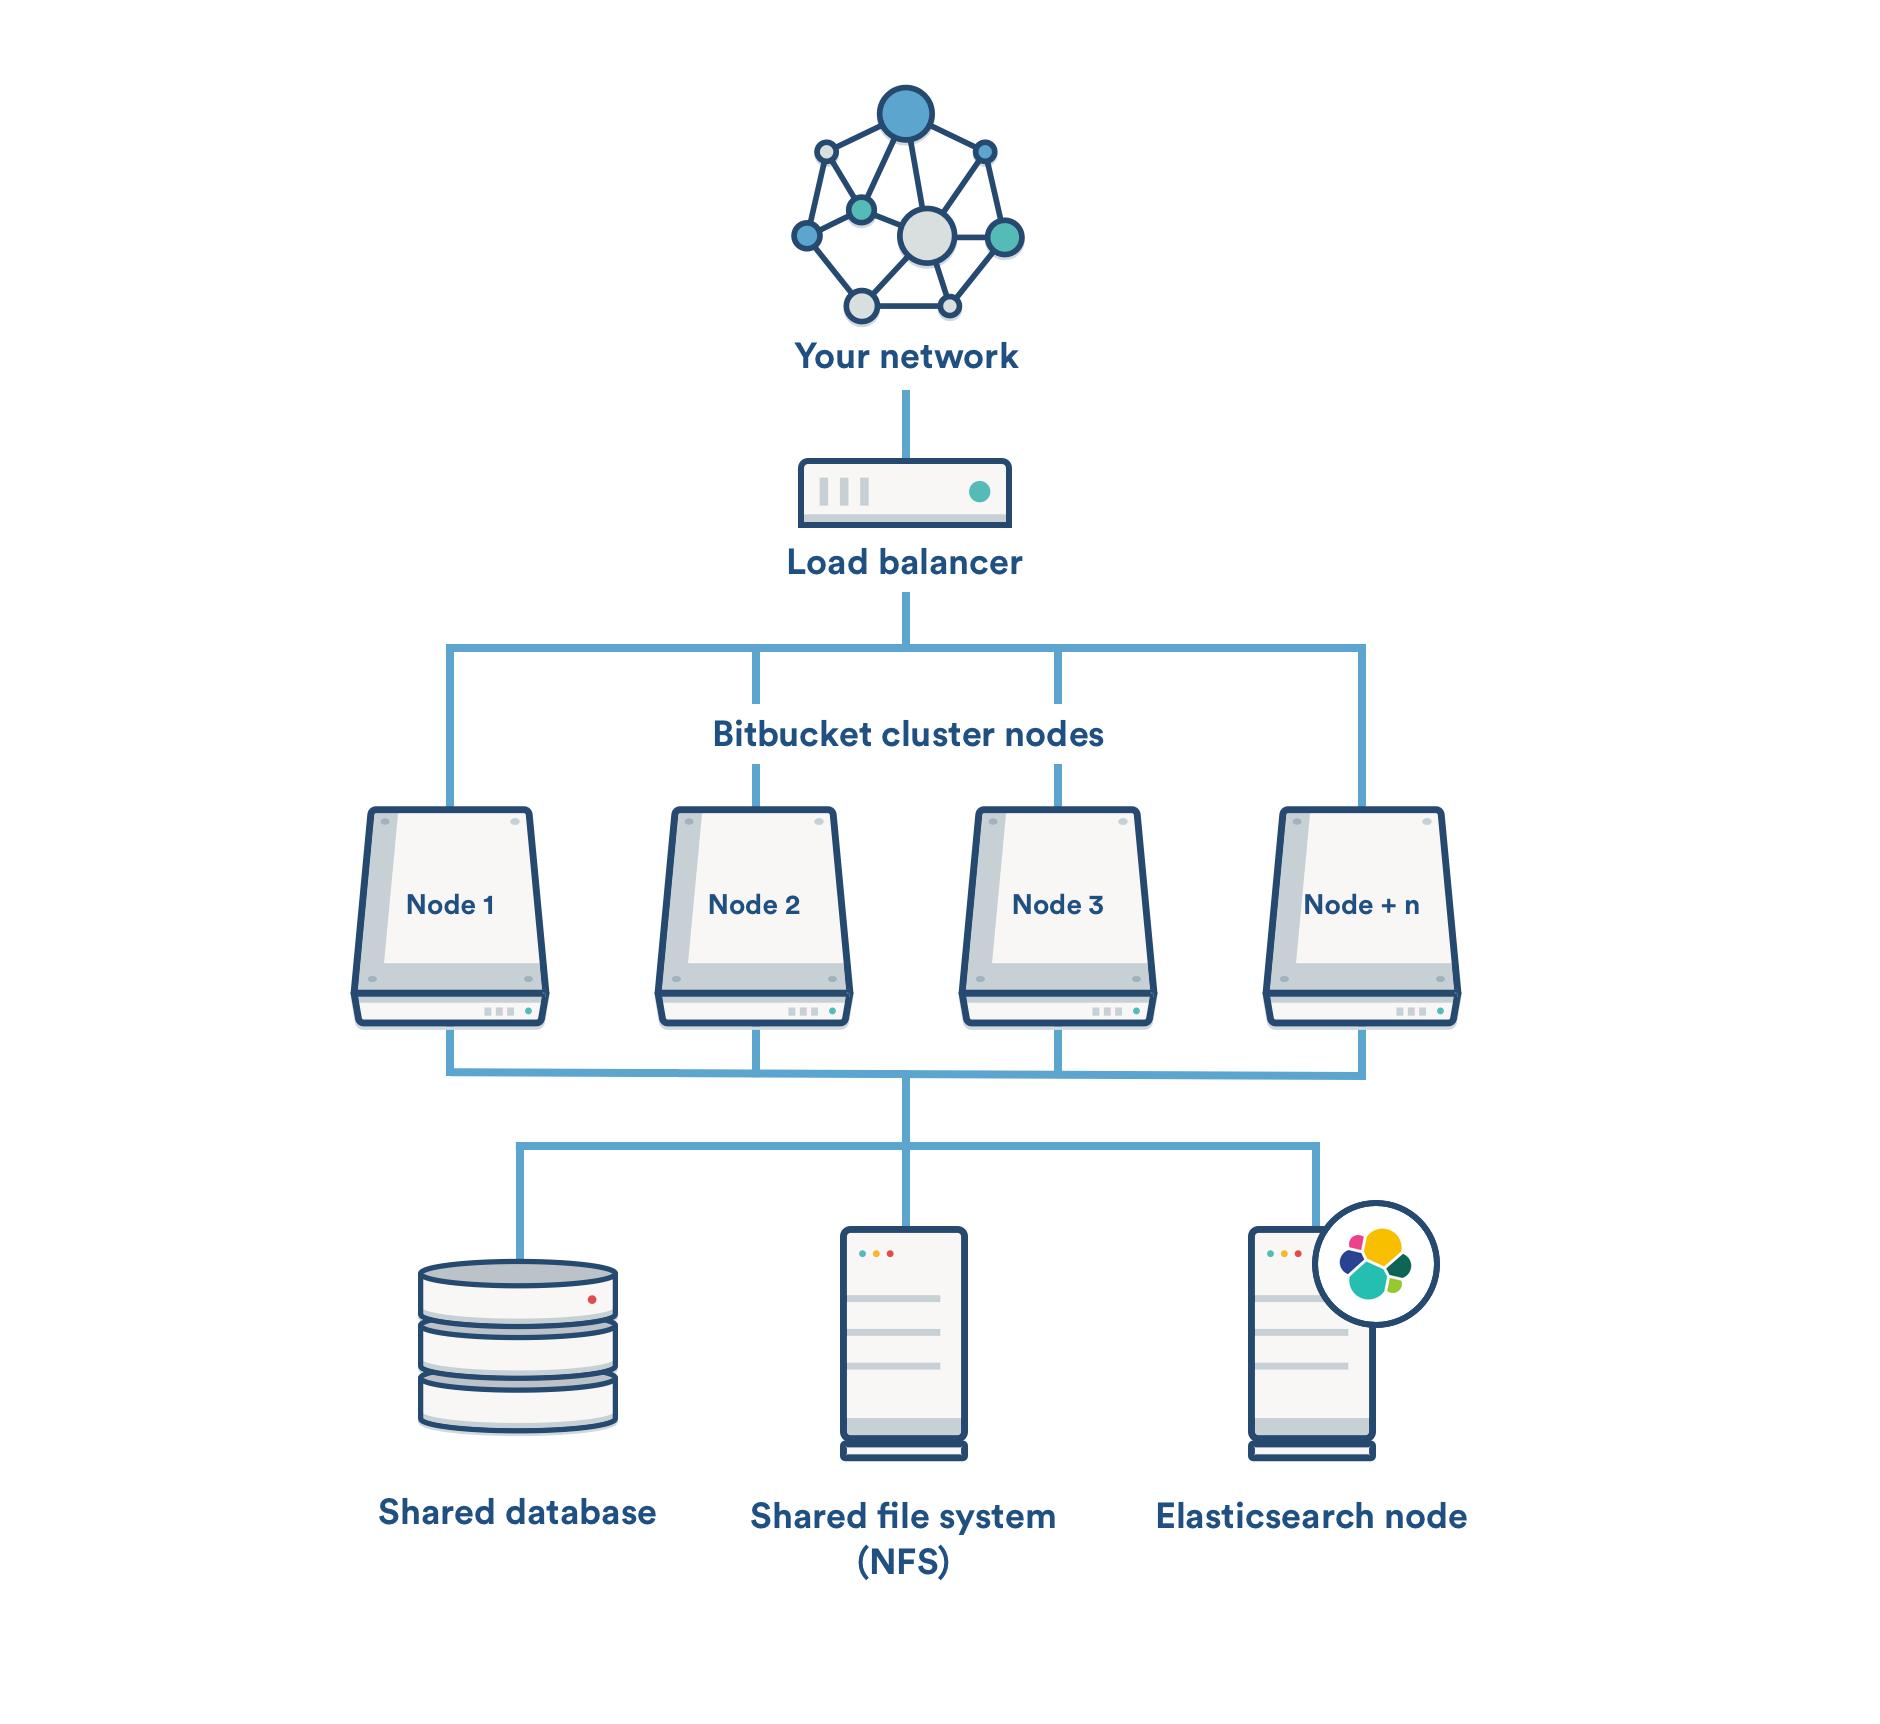 Use an Elasticsearch cluster with Bitbucket Data Center - Atlassian